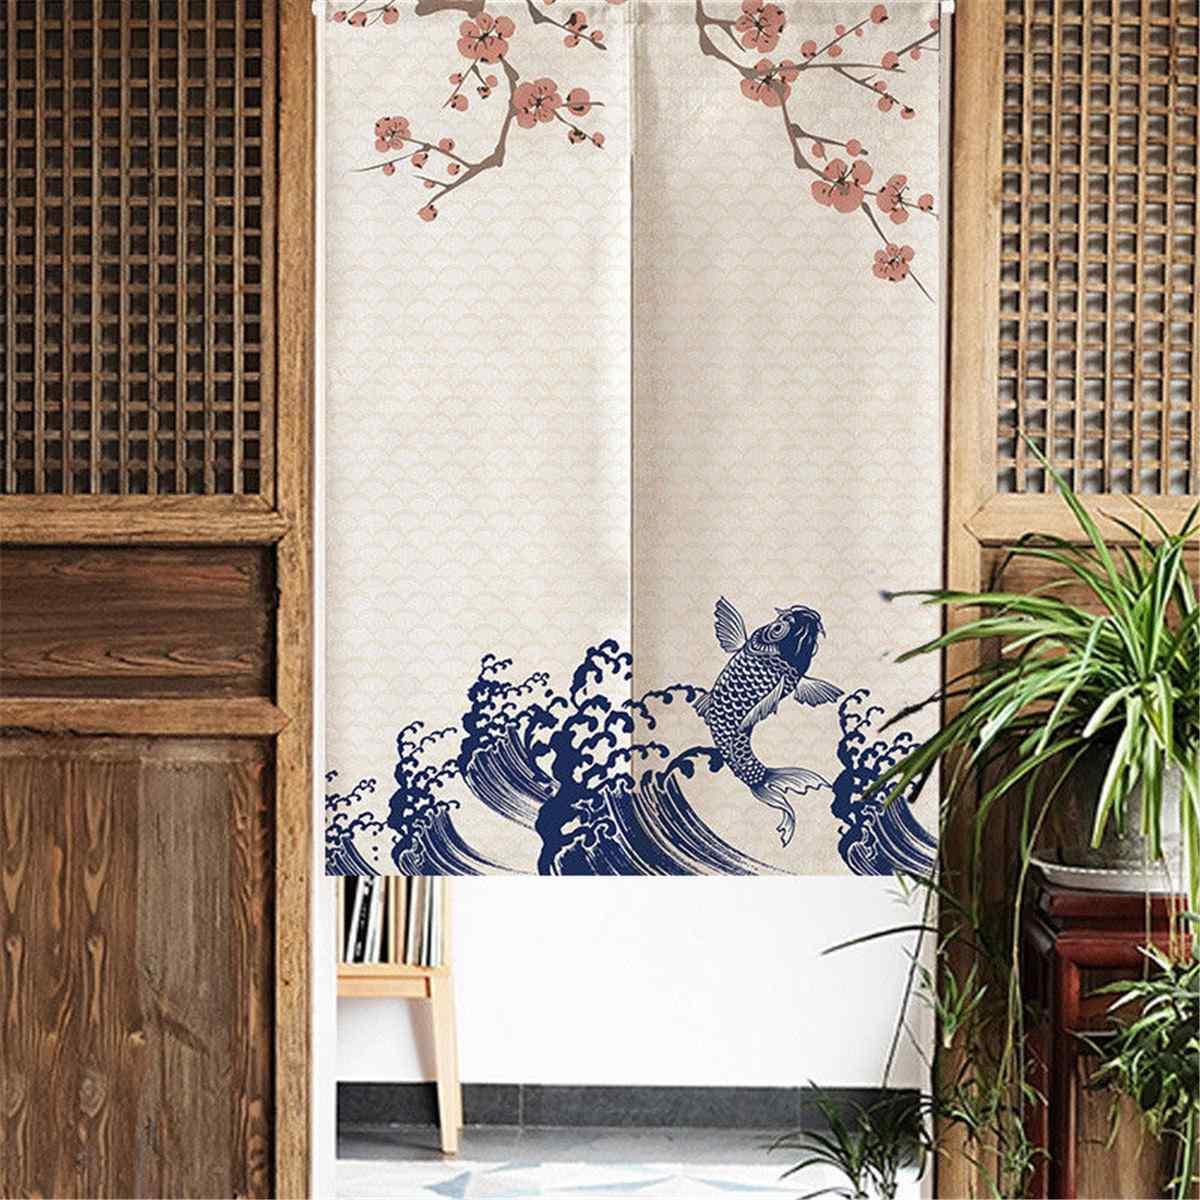 Romantic Blossom Cherry Tapestry Kitchen Curtains Japanese Noren Doorway Curtain 85X150cm Home Decorative Door Curtain